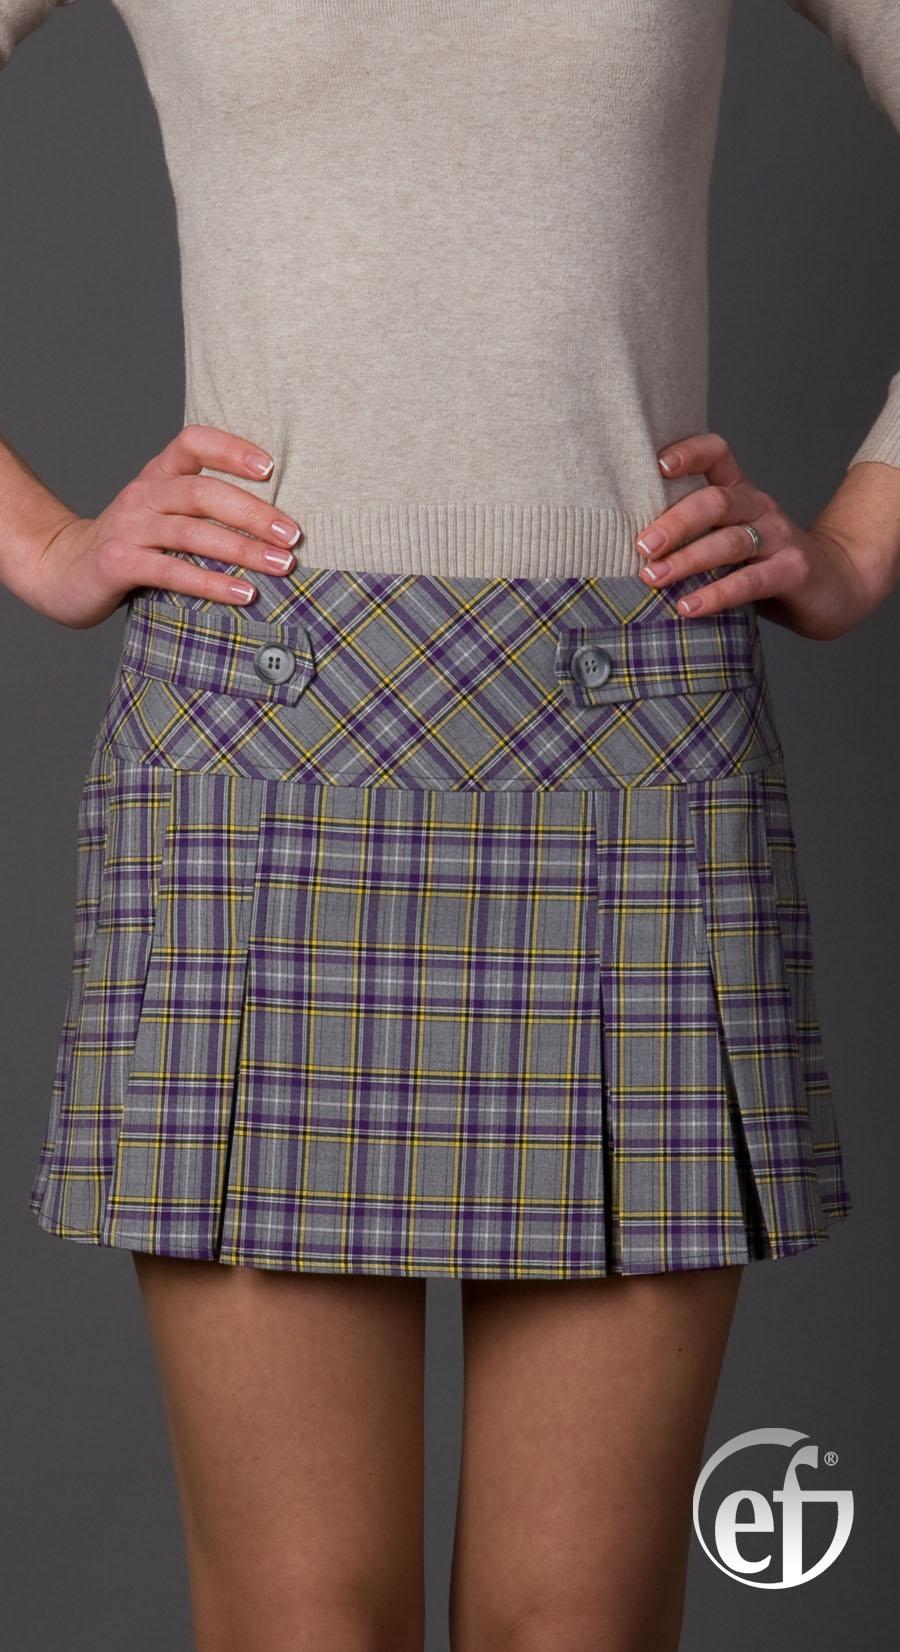 Сделай Сам: Ассиметричная юбка! Тренд лета! - Bezdushna 92